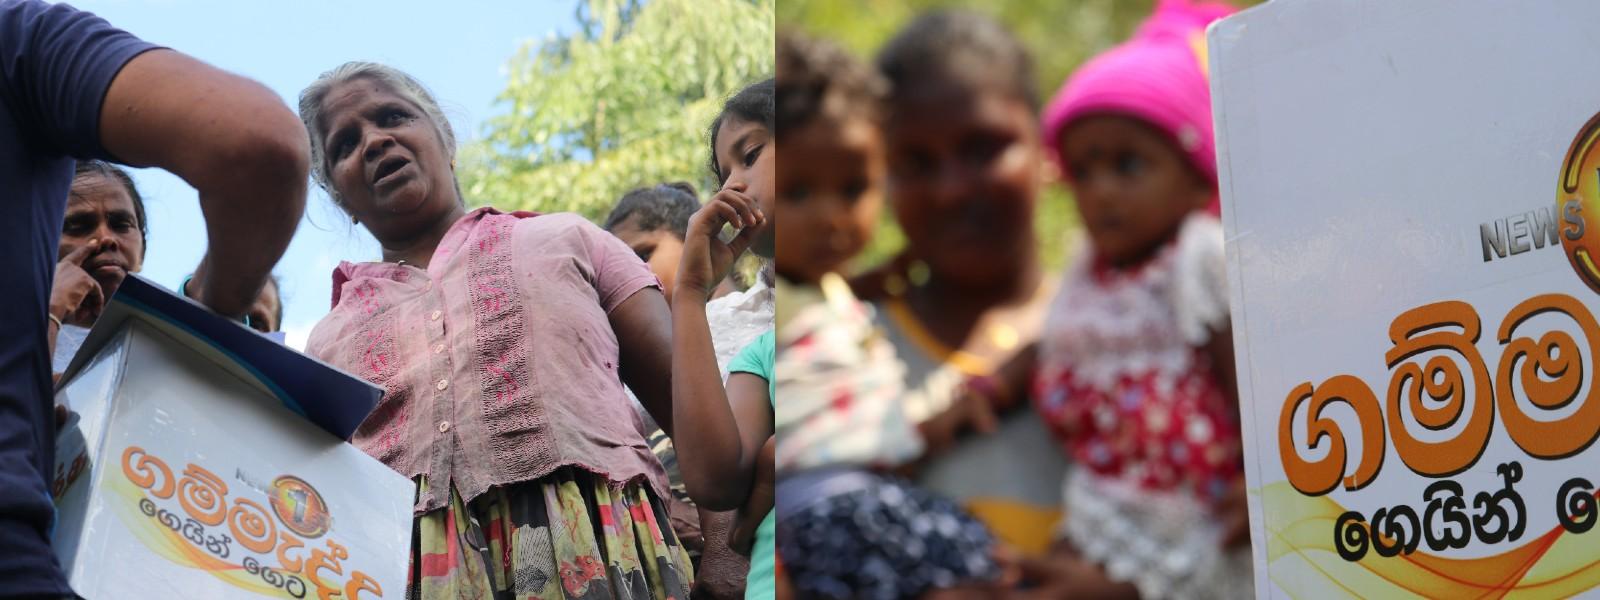 Gammadda continues to walk the length and breadth of Sri Lanka